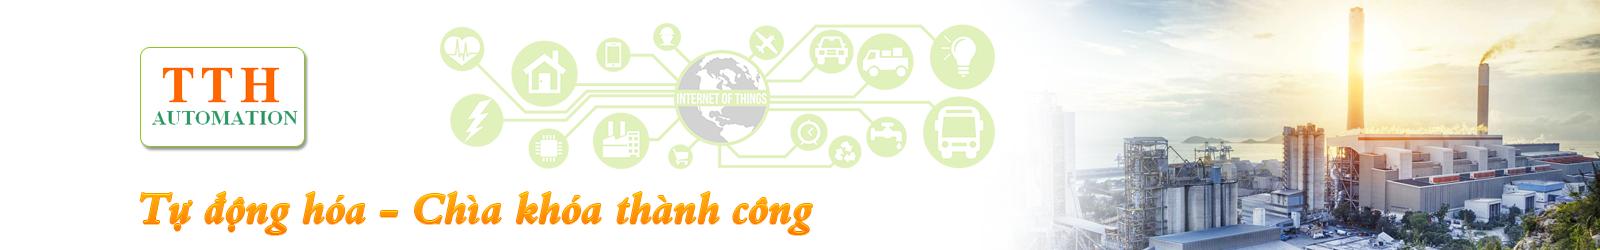 Công ty TTH Automatic Việt Nam